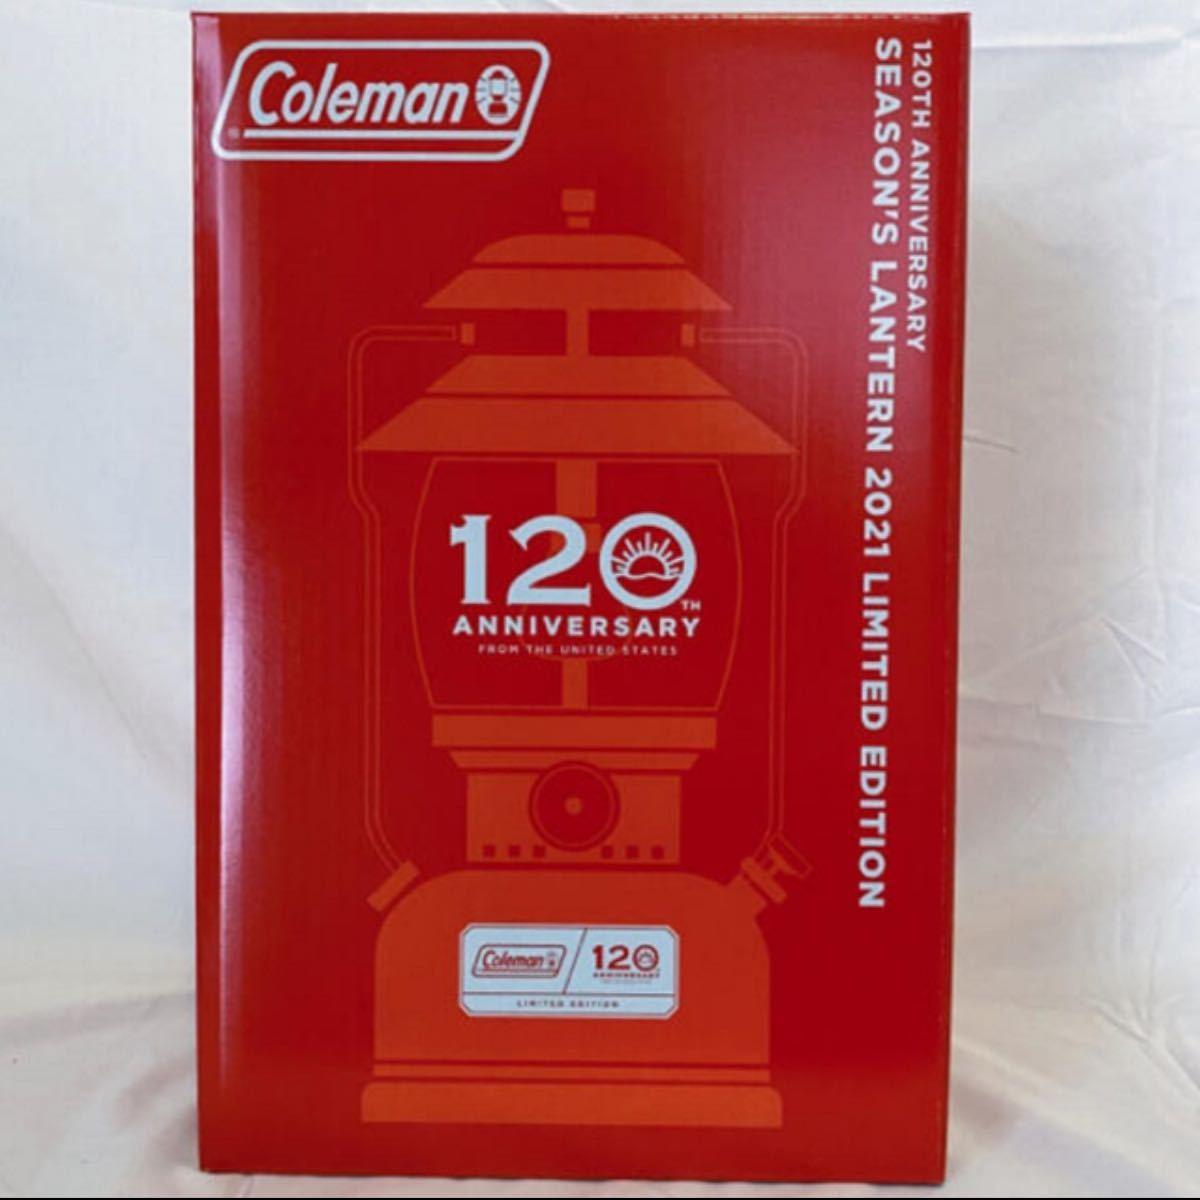 Coleman ランタン 120thアニバーサリー シーズンズランタン 新品